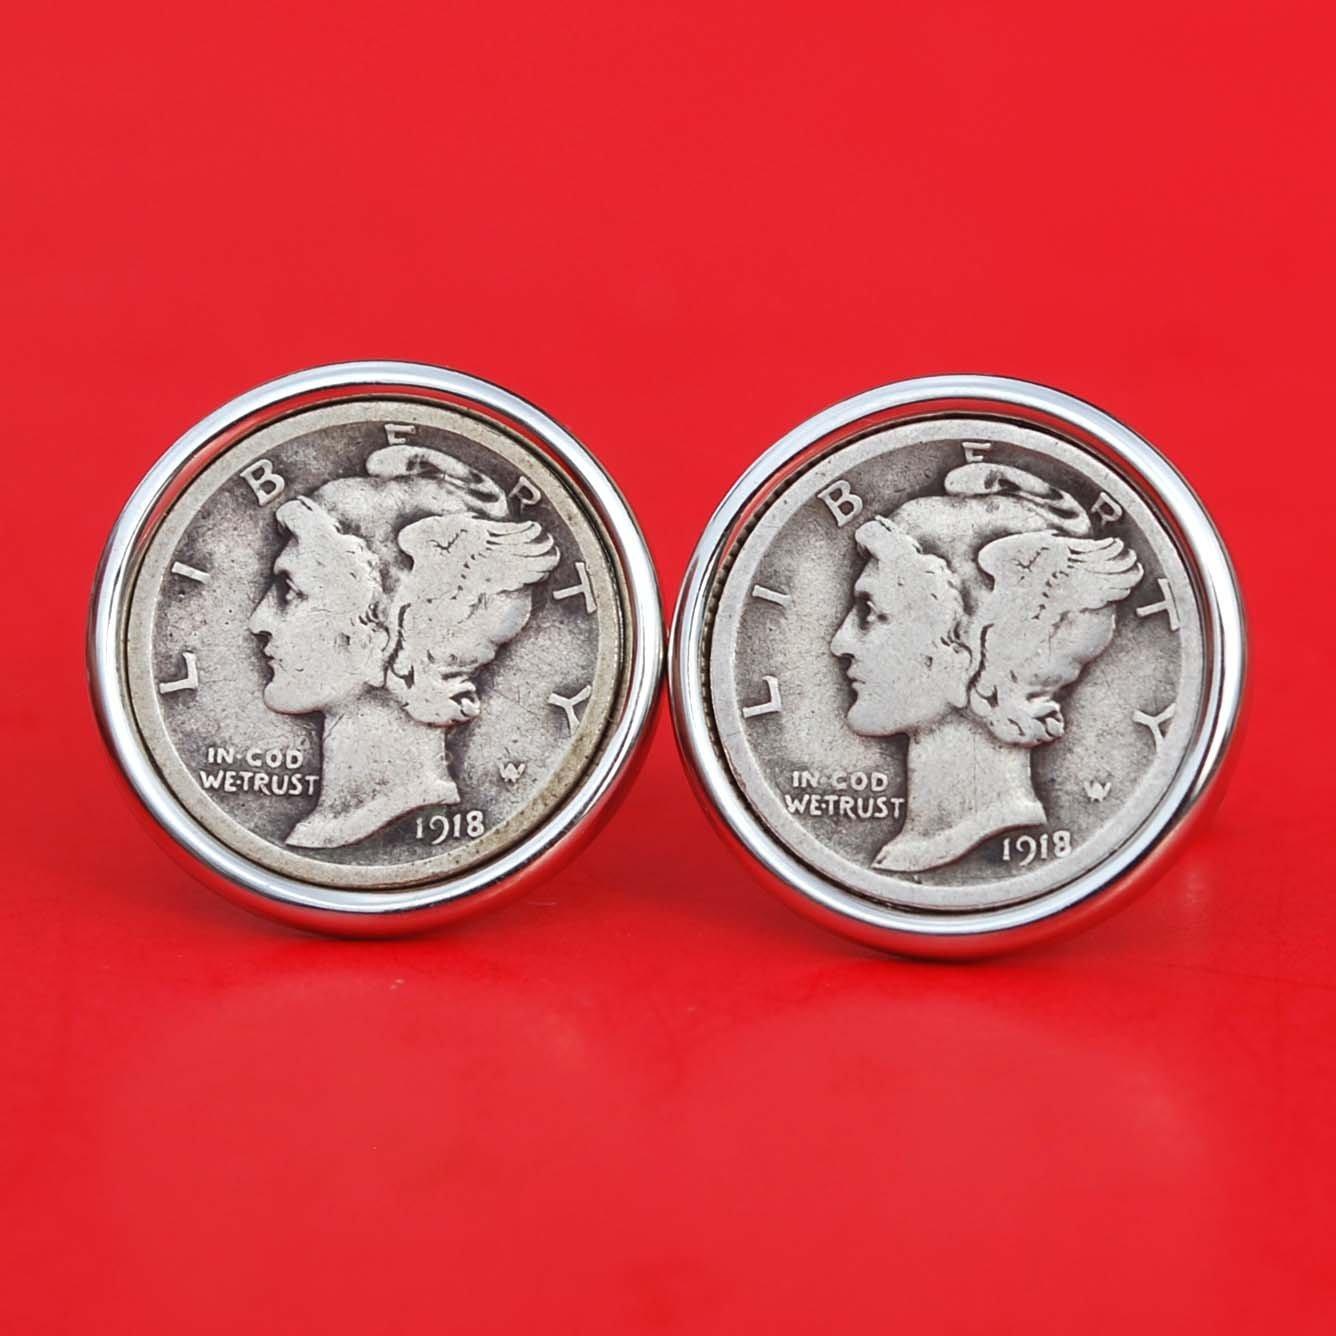 US 1918 Mercury Dime 90% Silver 10 Cent Coin Cufflinks NEW - Beautiful